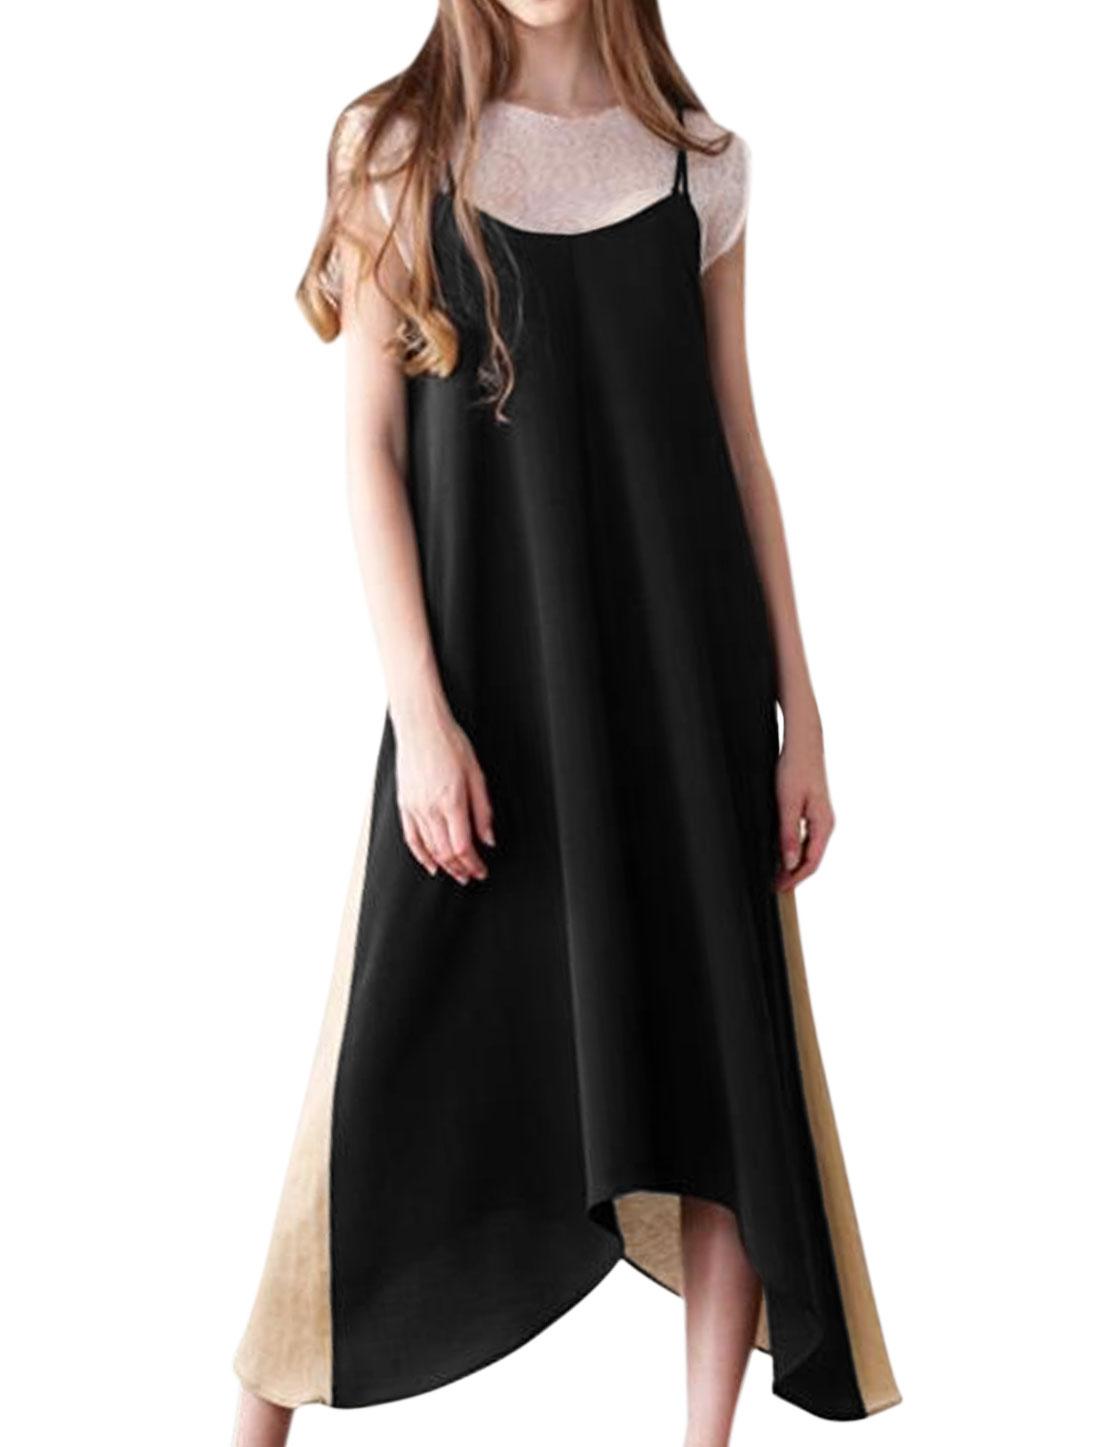 Women Spaghetti Straps Contrast Color Loose Cami Dress Black M